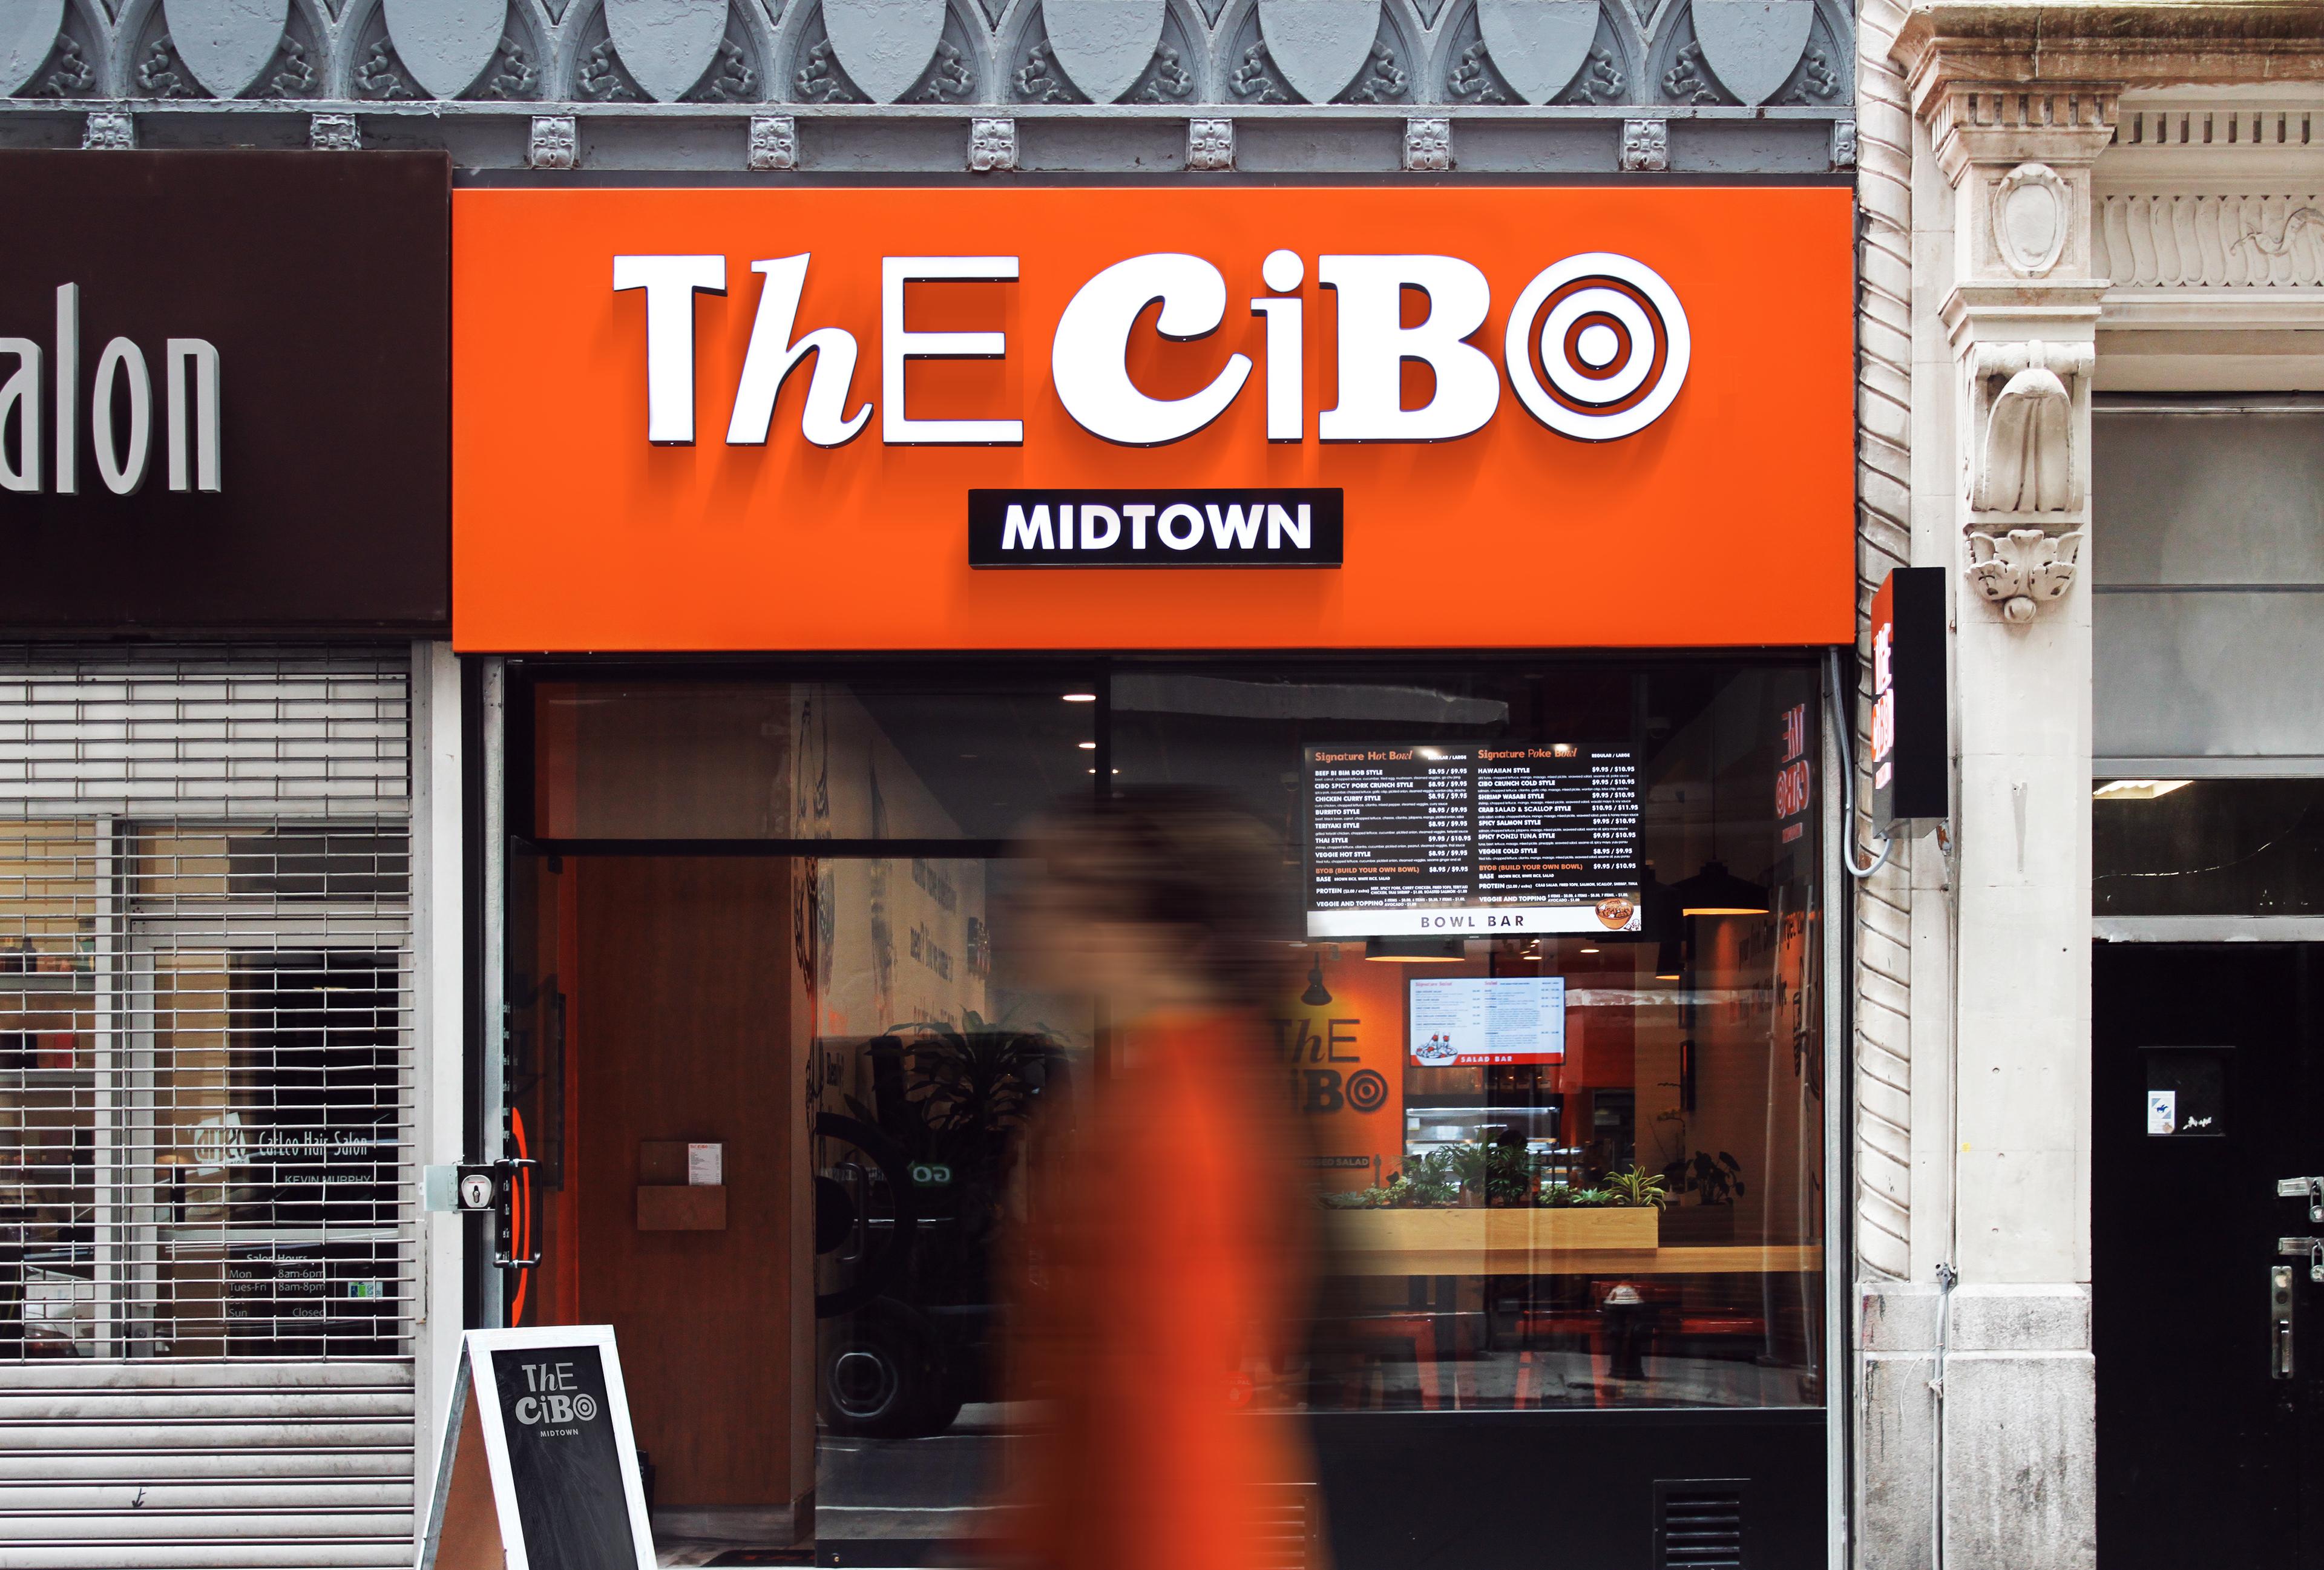 The Cibo fast casual burger restaurant branding by Brandon Archibald in Ukraine